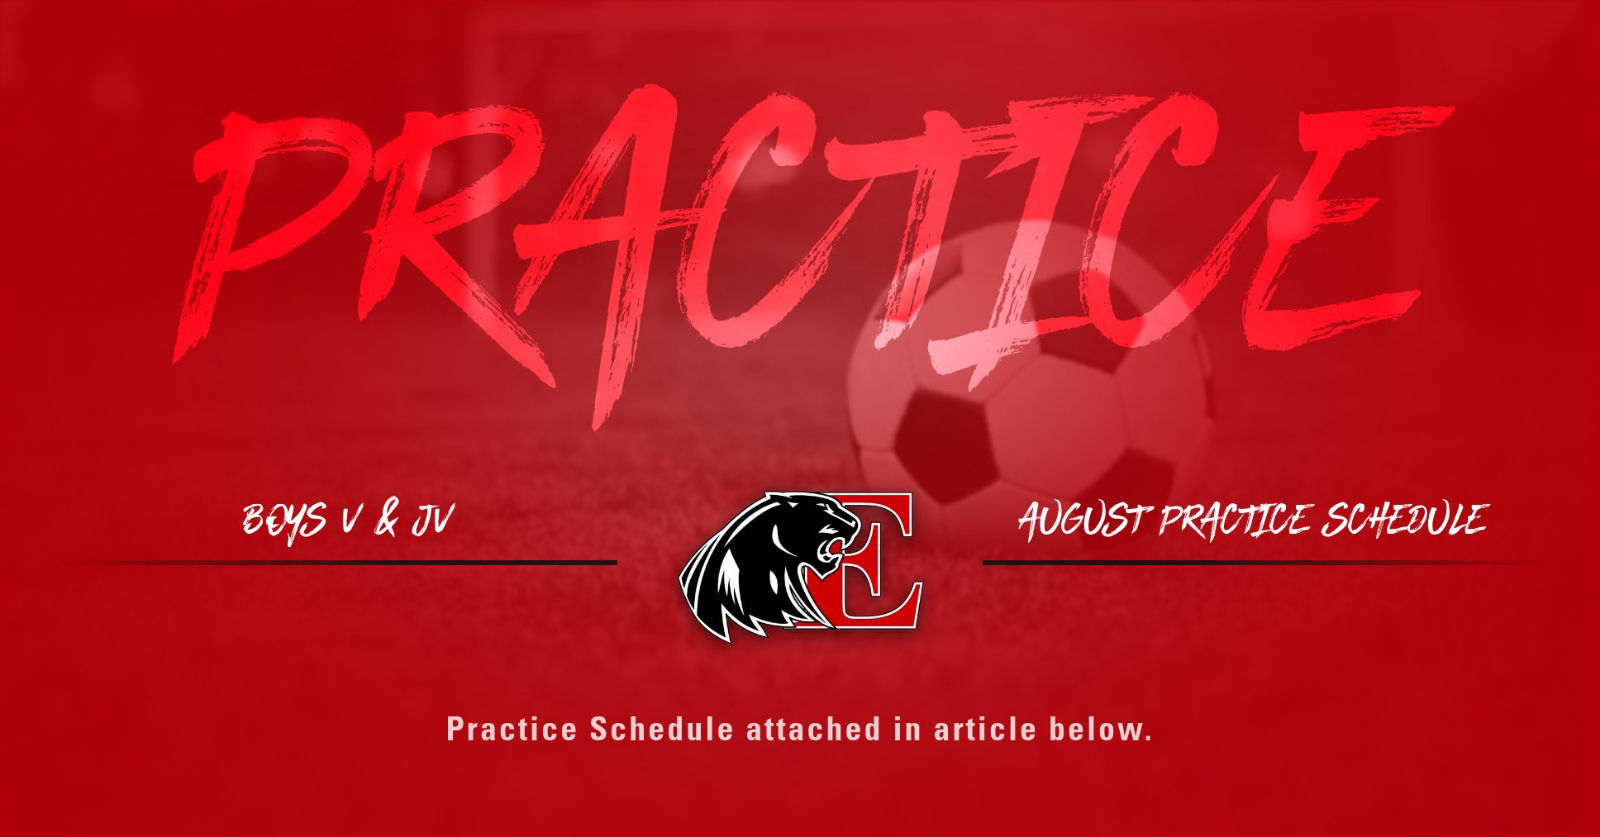 Boys Varsity & JV Practice Schedule for August